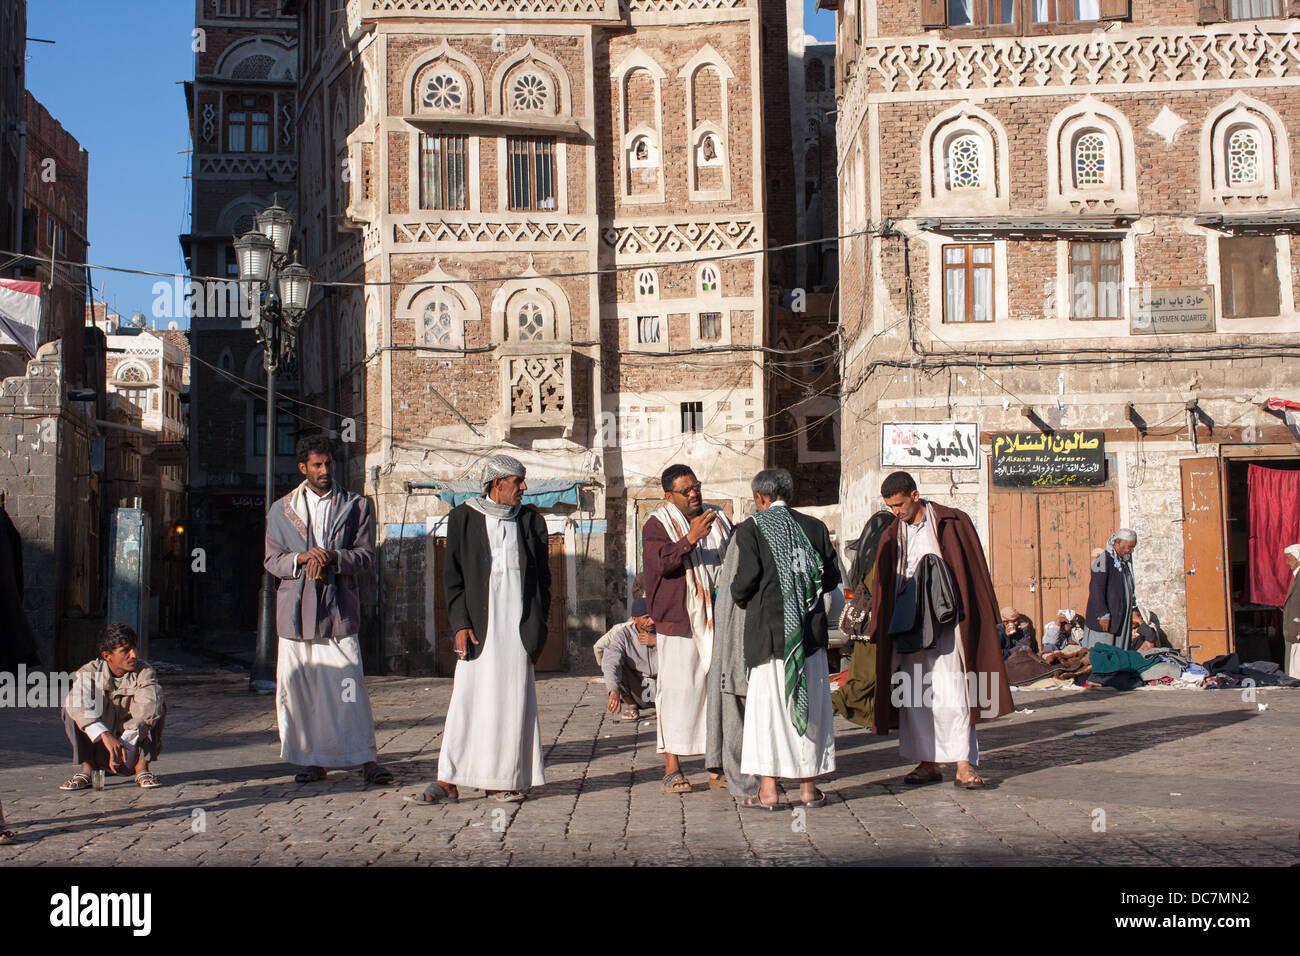 Group of men in the old city, Sanaa, YemenStock Photo